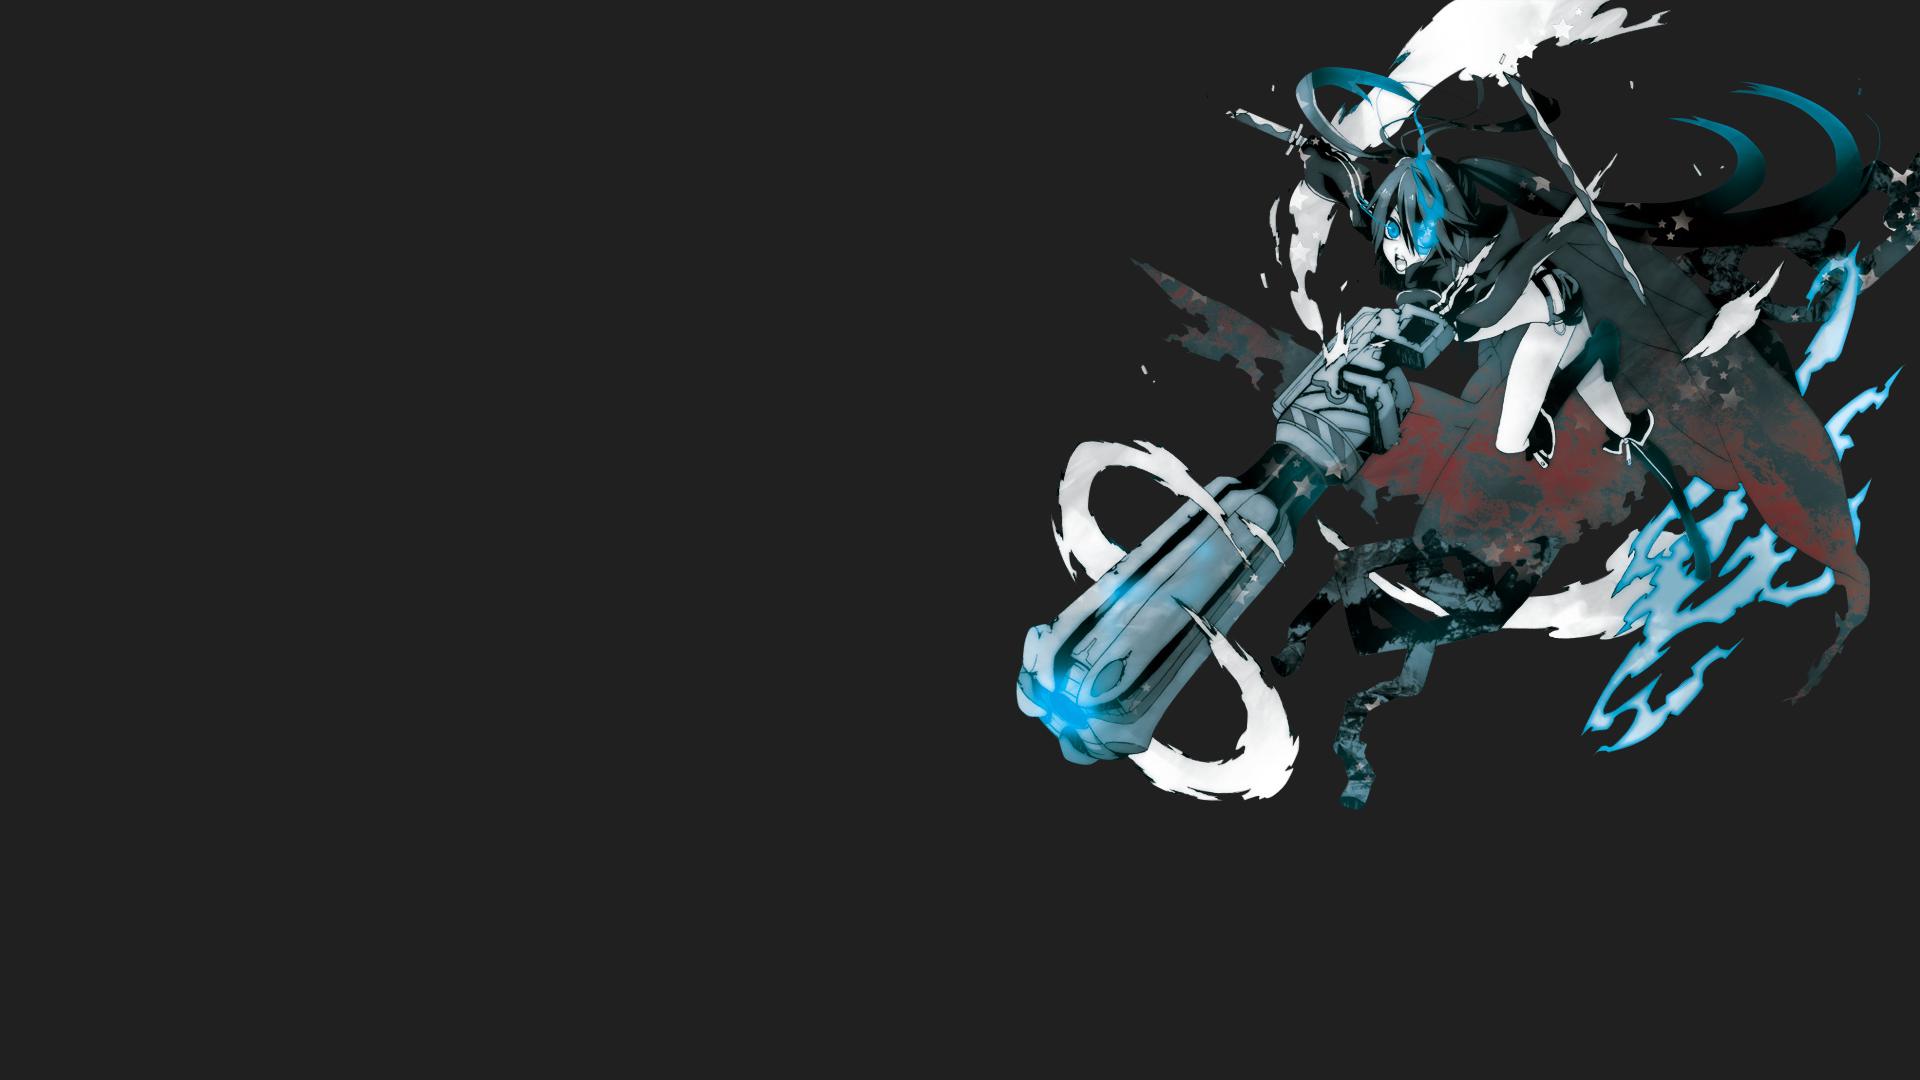 anime black rock shooter wallpaper